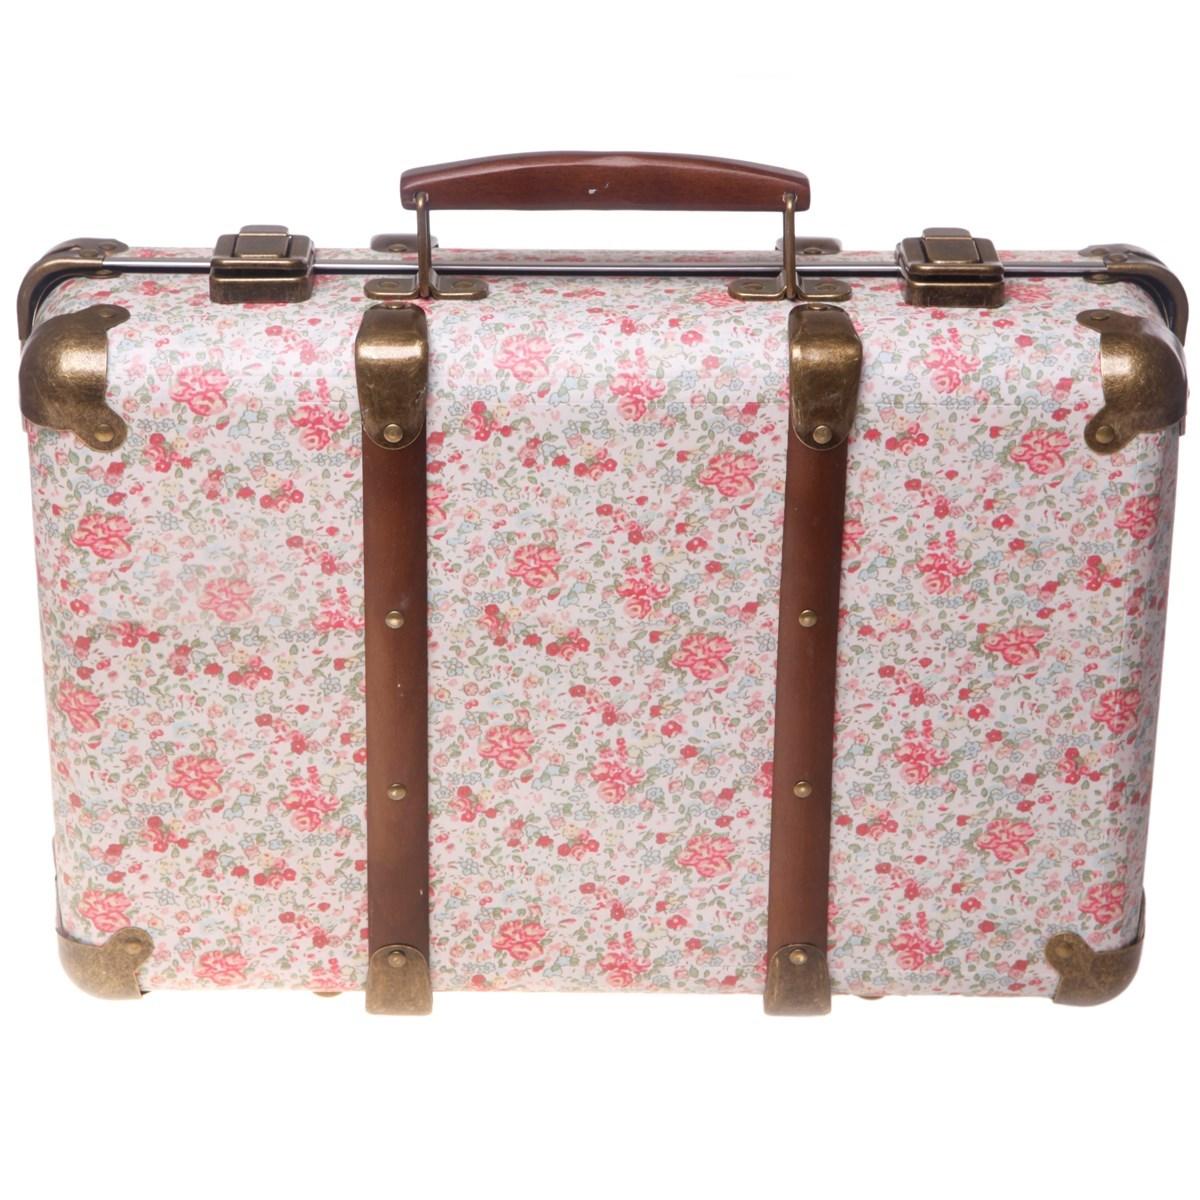 Vintage Floral Suitcase - Roses